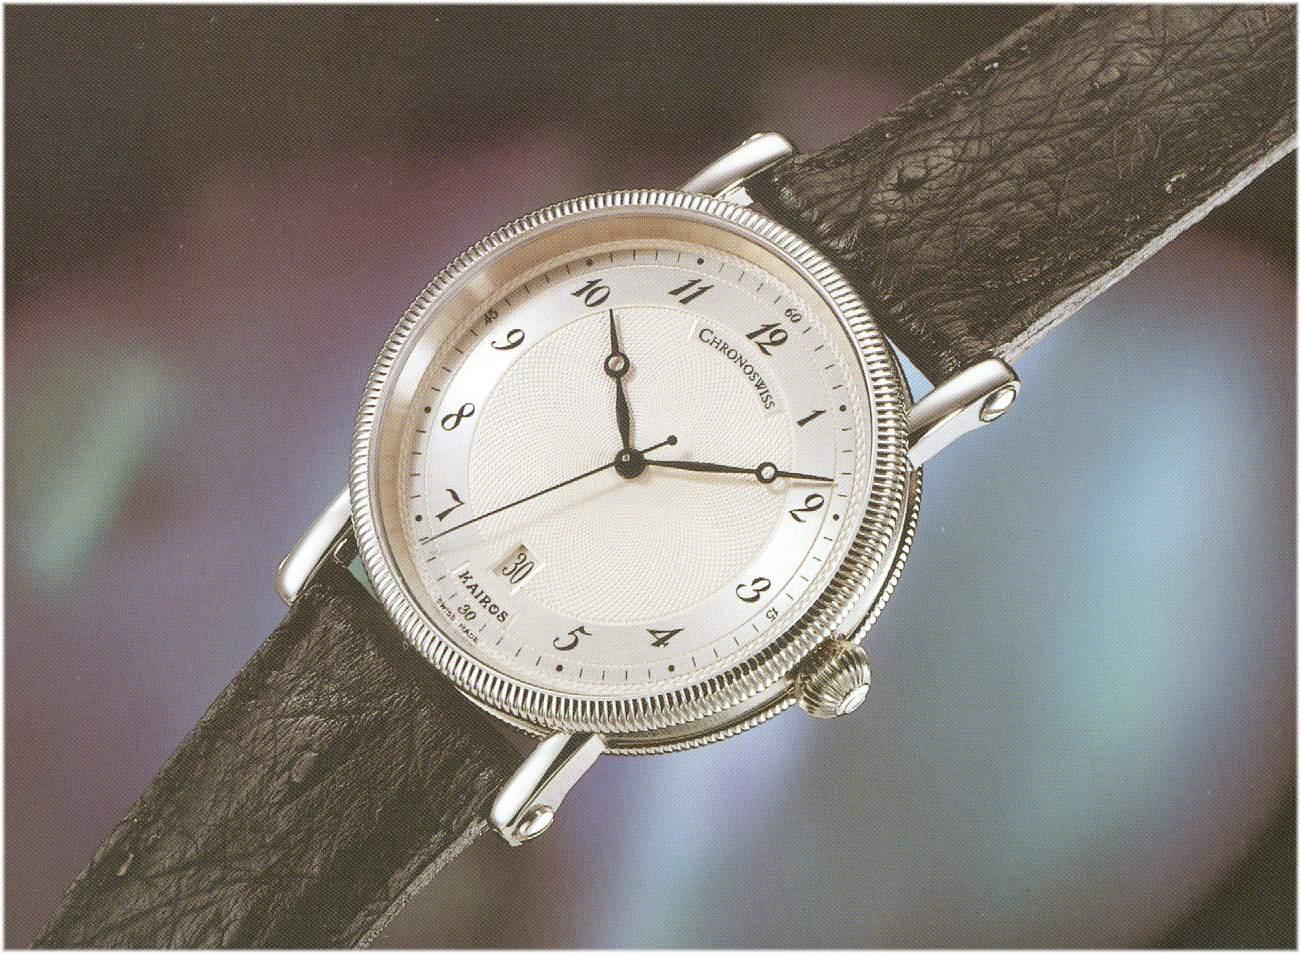 Das schlichte Chronoswiss Uhrenmodell Kairos